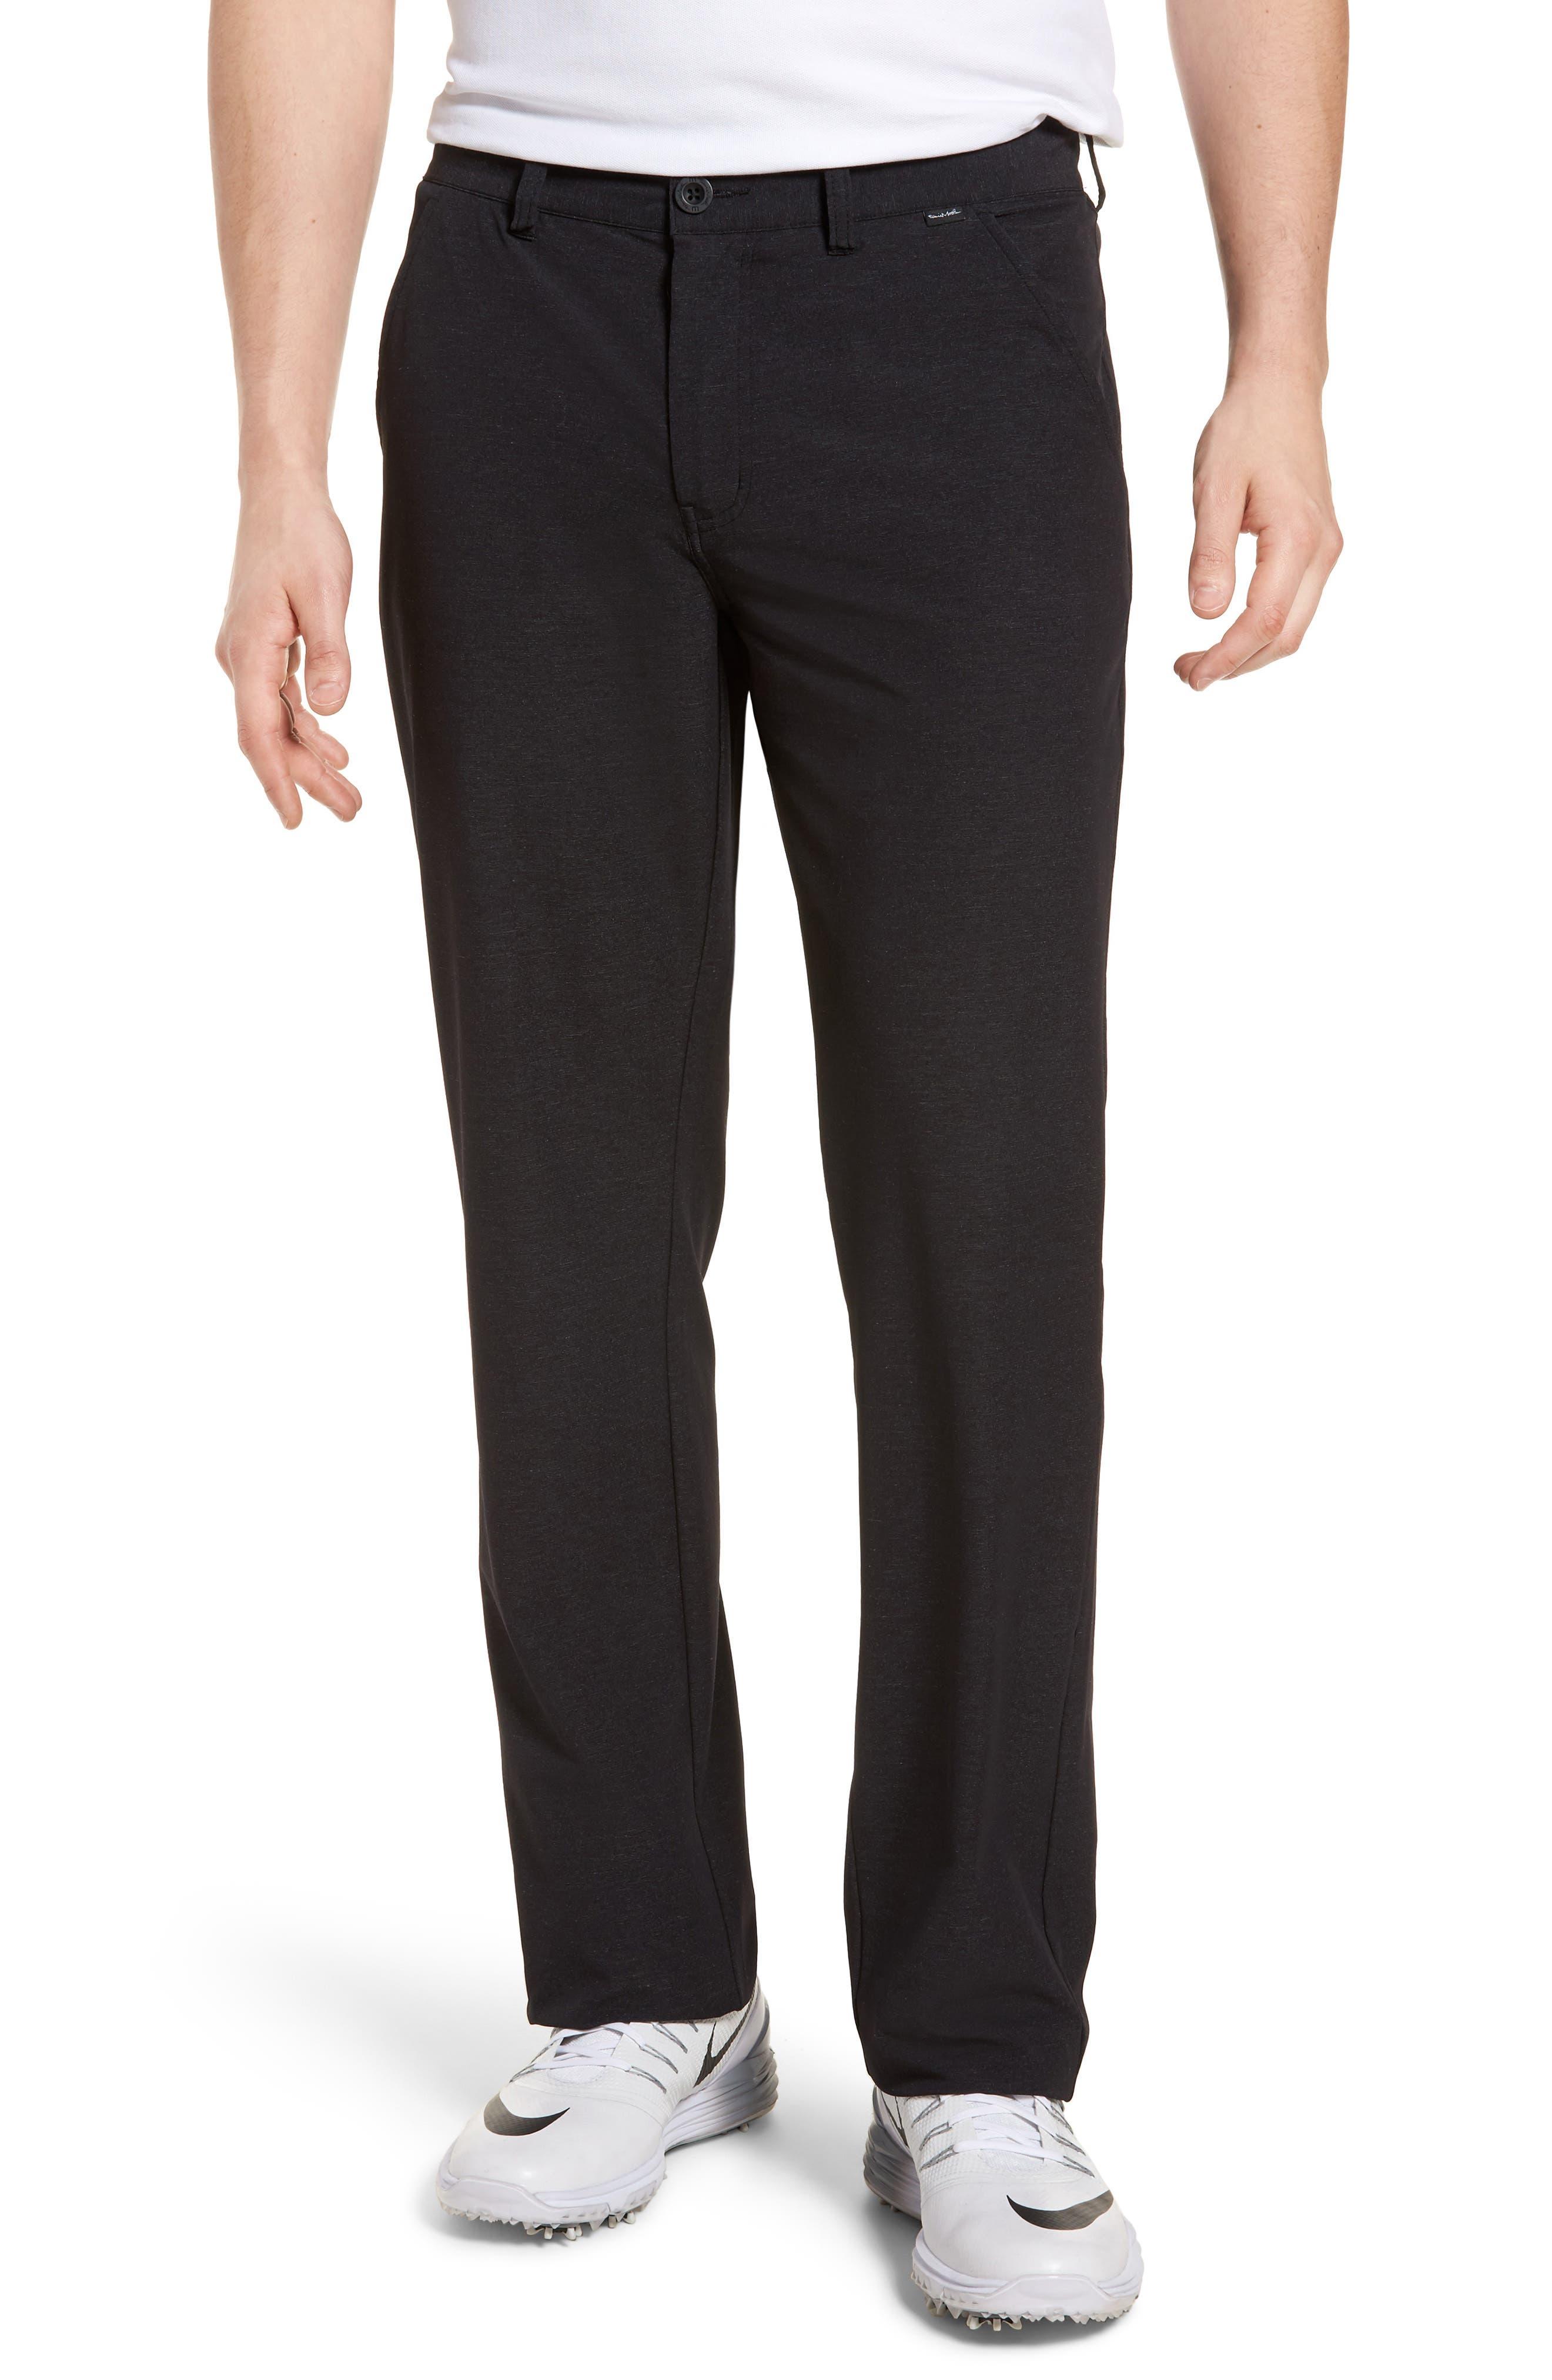 Mercurio Regular Fit Four-Way Stretch Pants,                             Main thumbnail 1, color,                             HEATHER BLACK